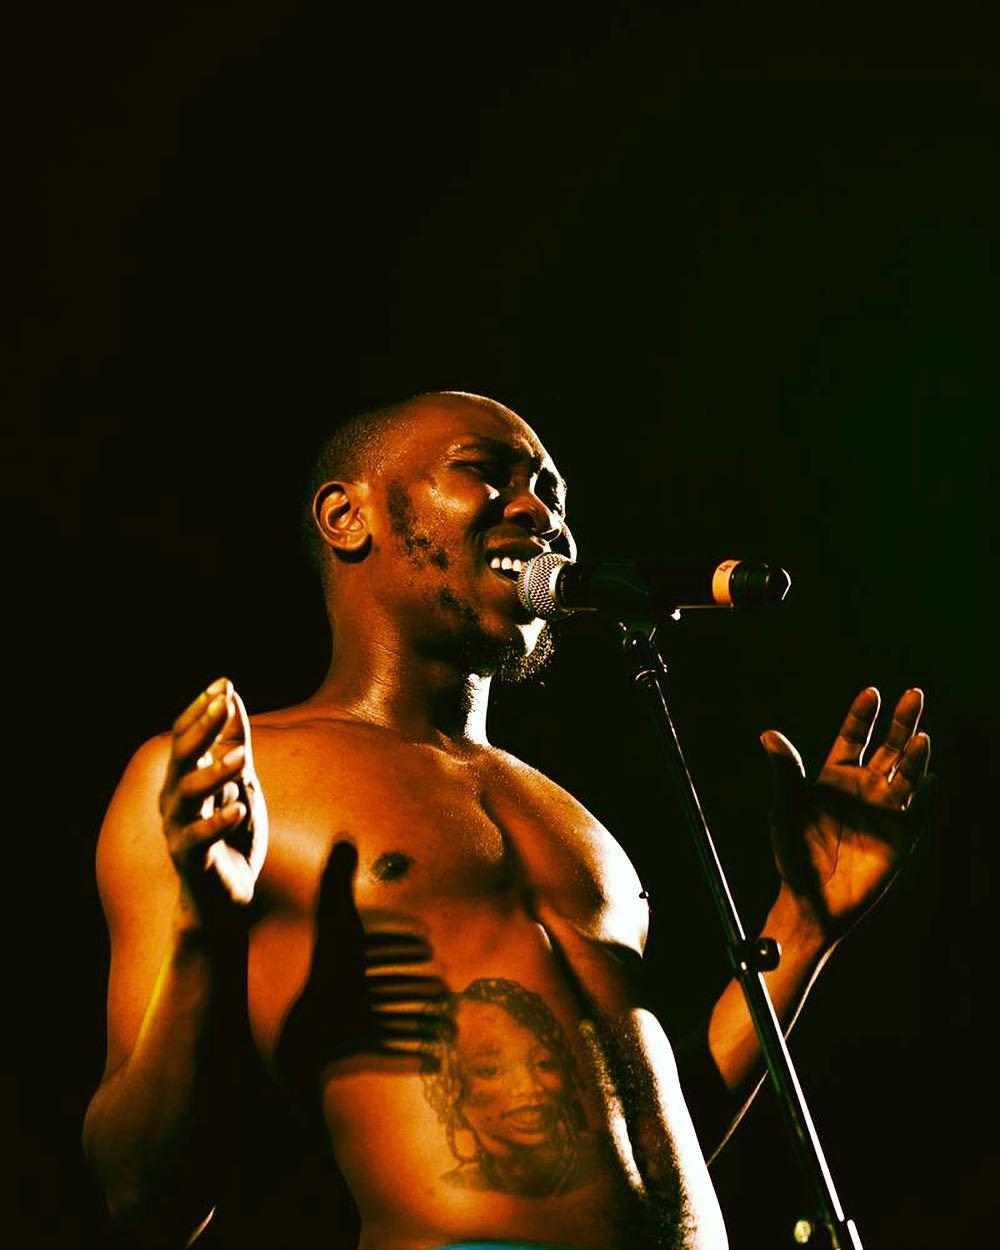 Seun Kuti tells Kanye West